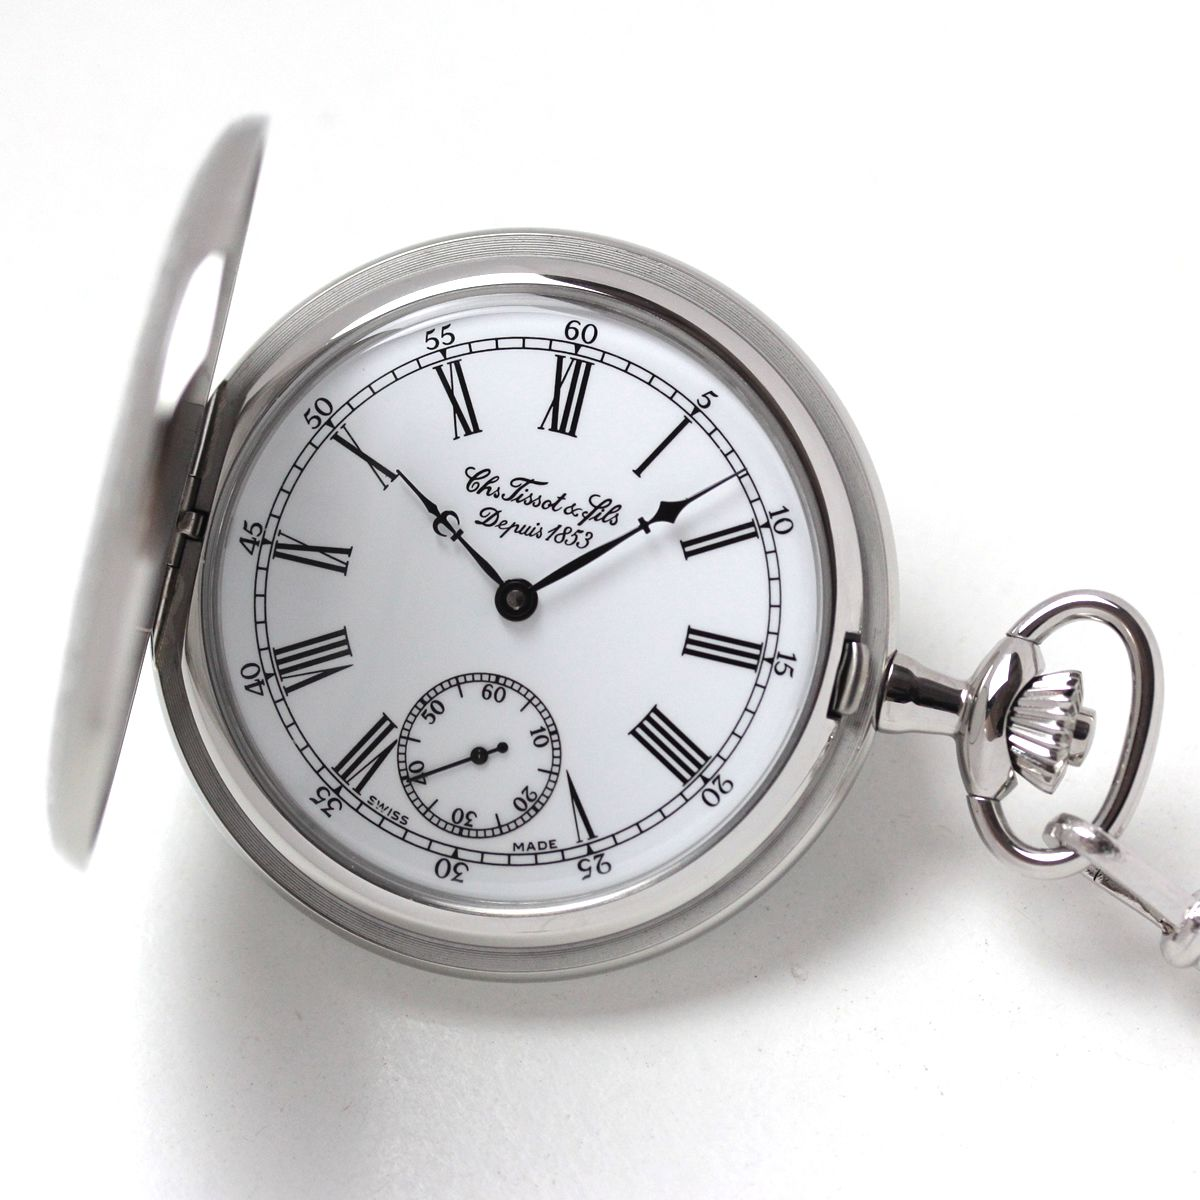 TISSOT/ティソ/T83.6.454.13 懐中時計